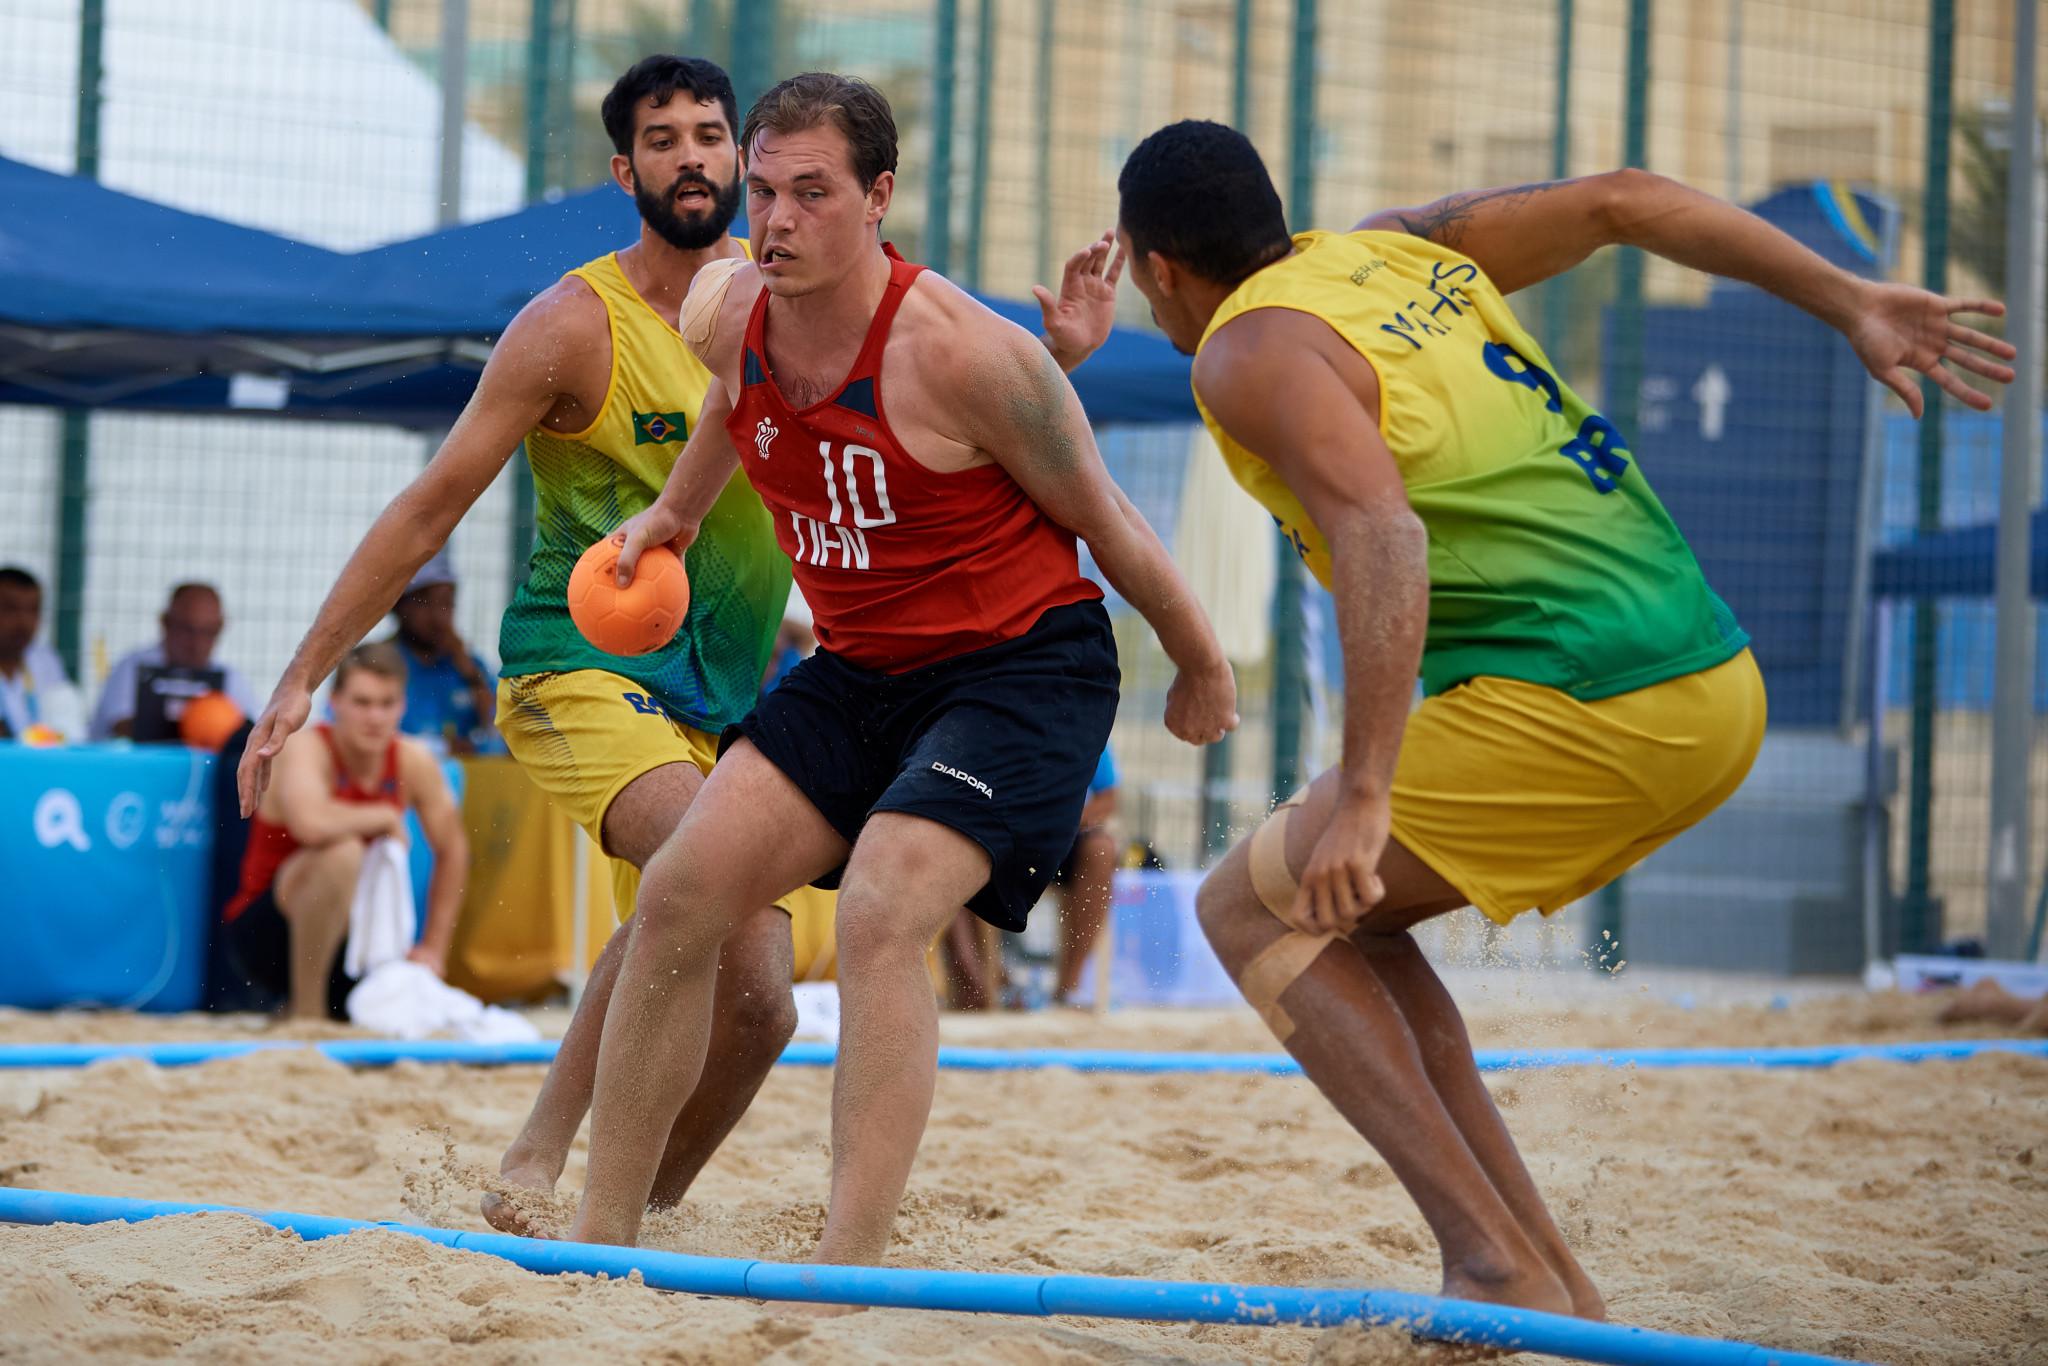 Denmark defeat beach handball world champions at ANOC World Beach Games